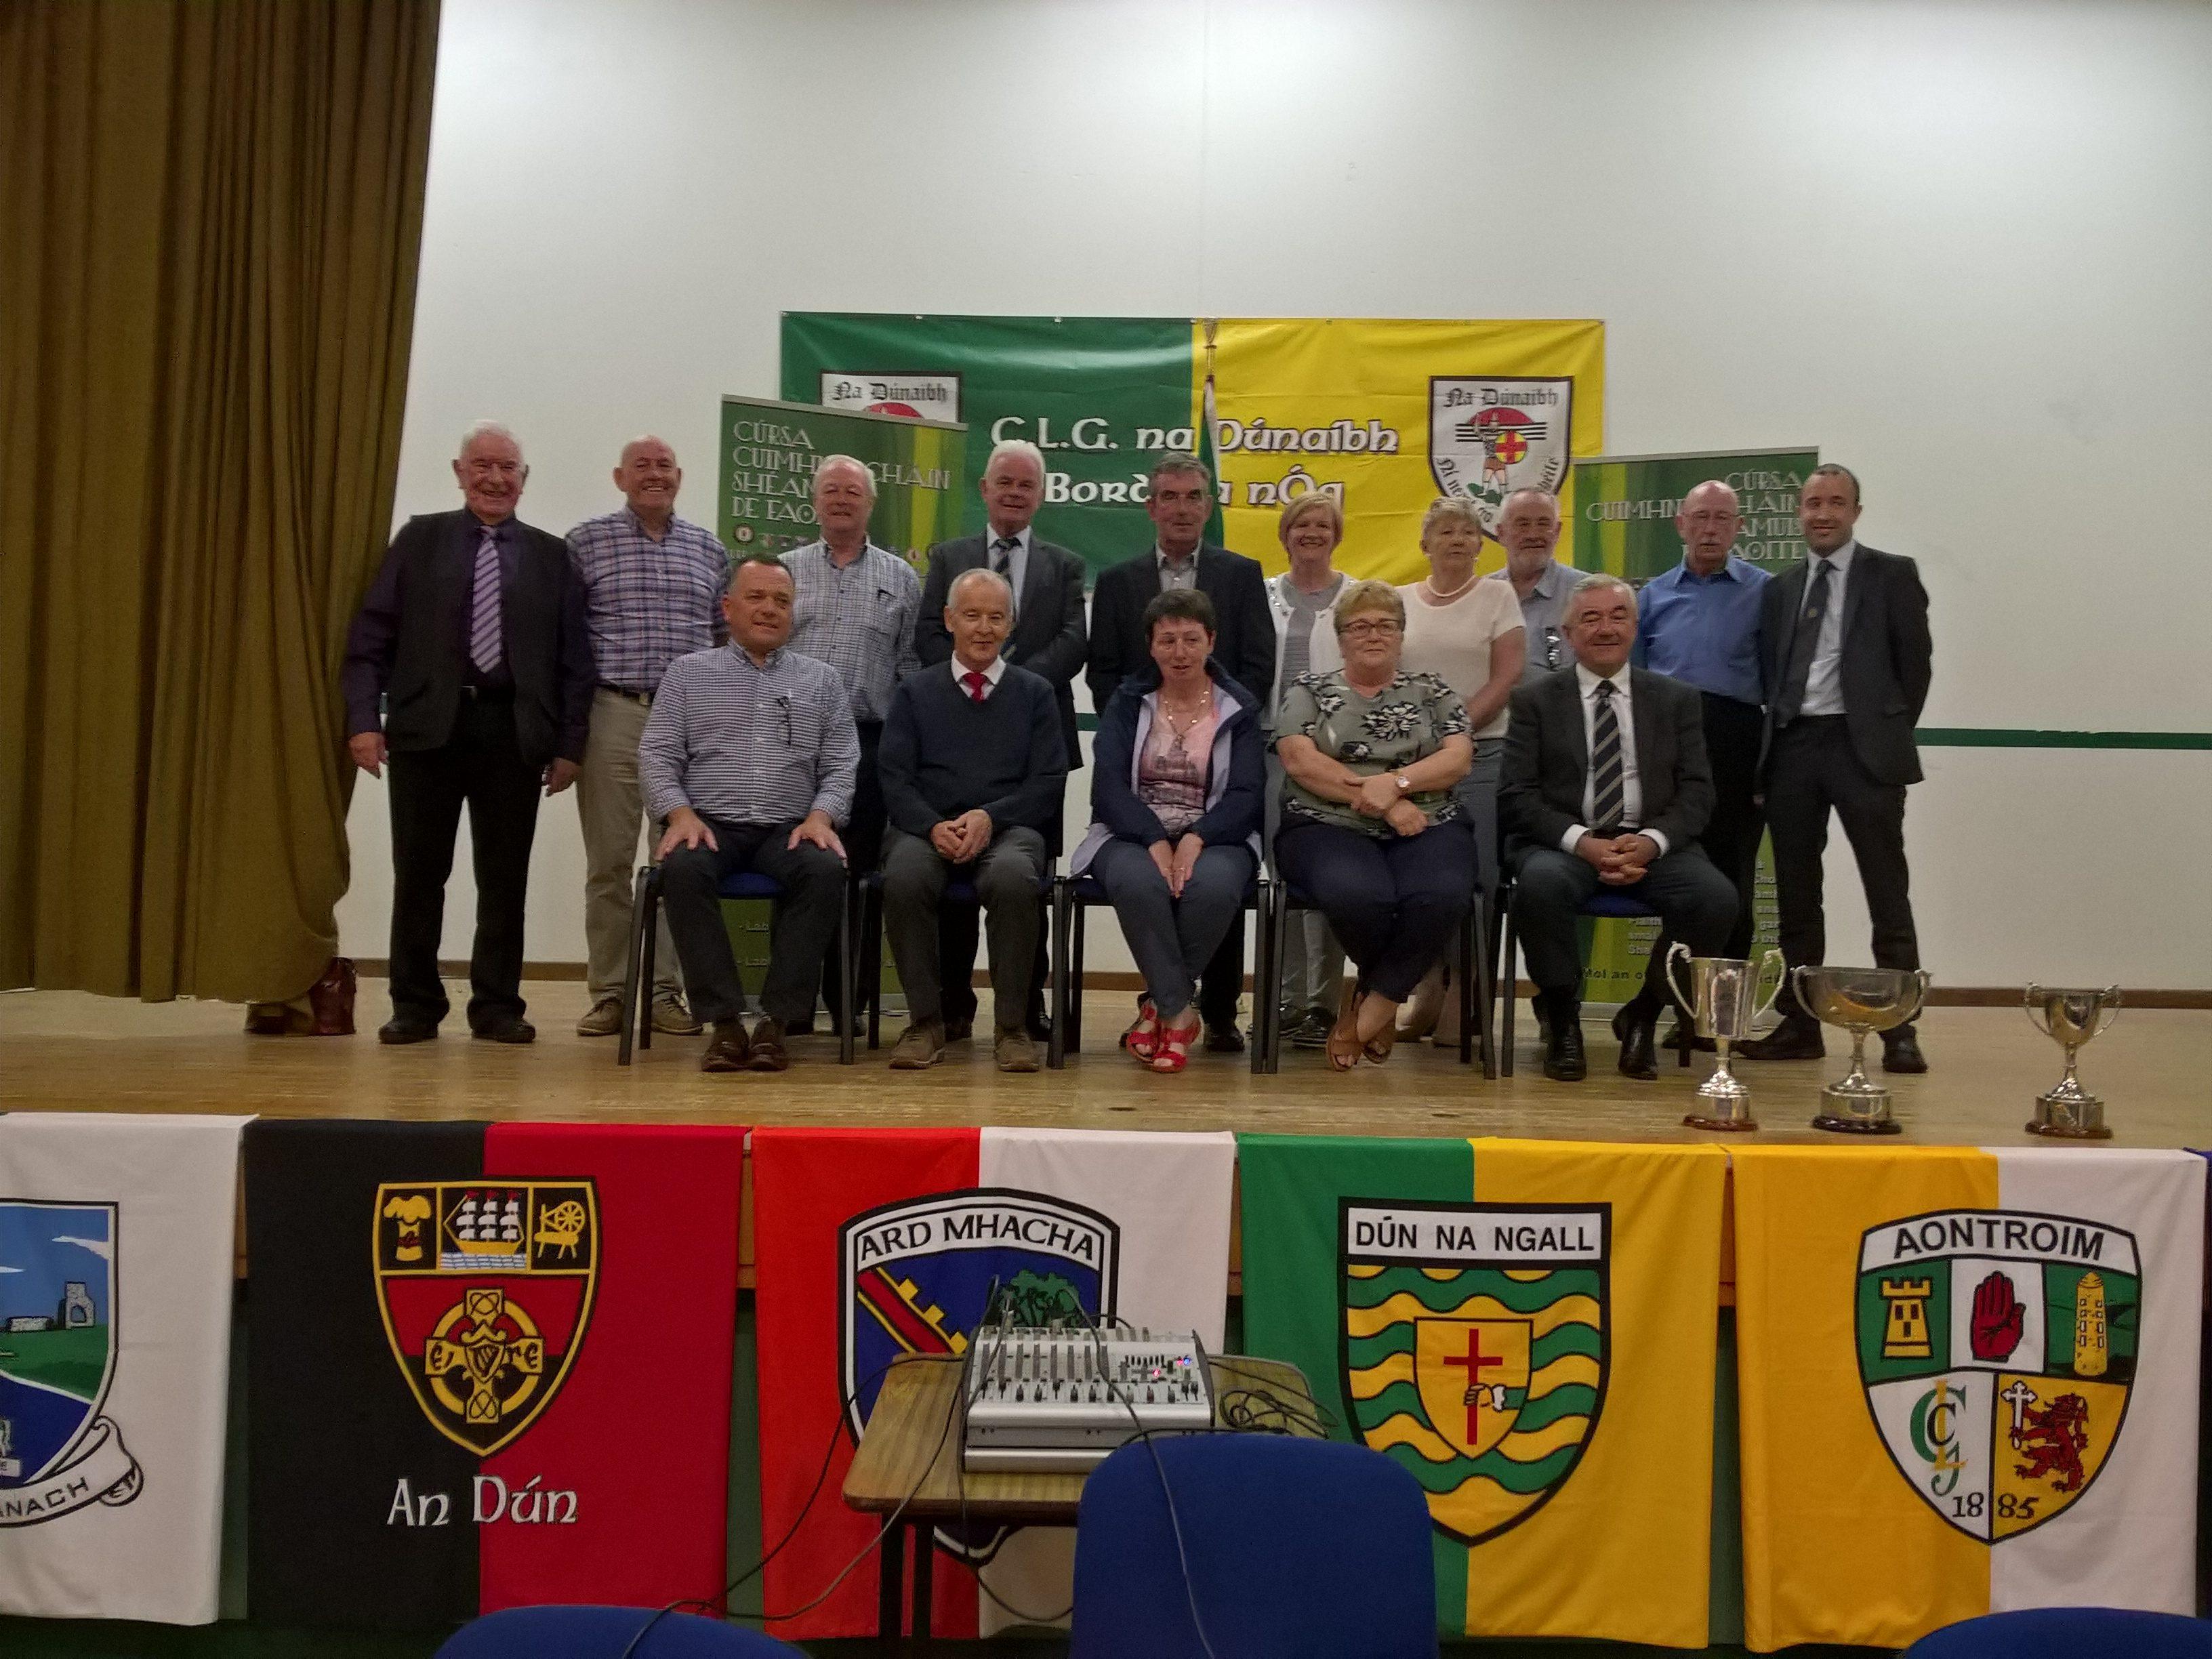 Cúrsa Gaeilge Shéamas de Faoite 1988 – 2018